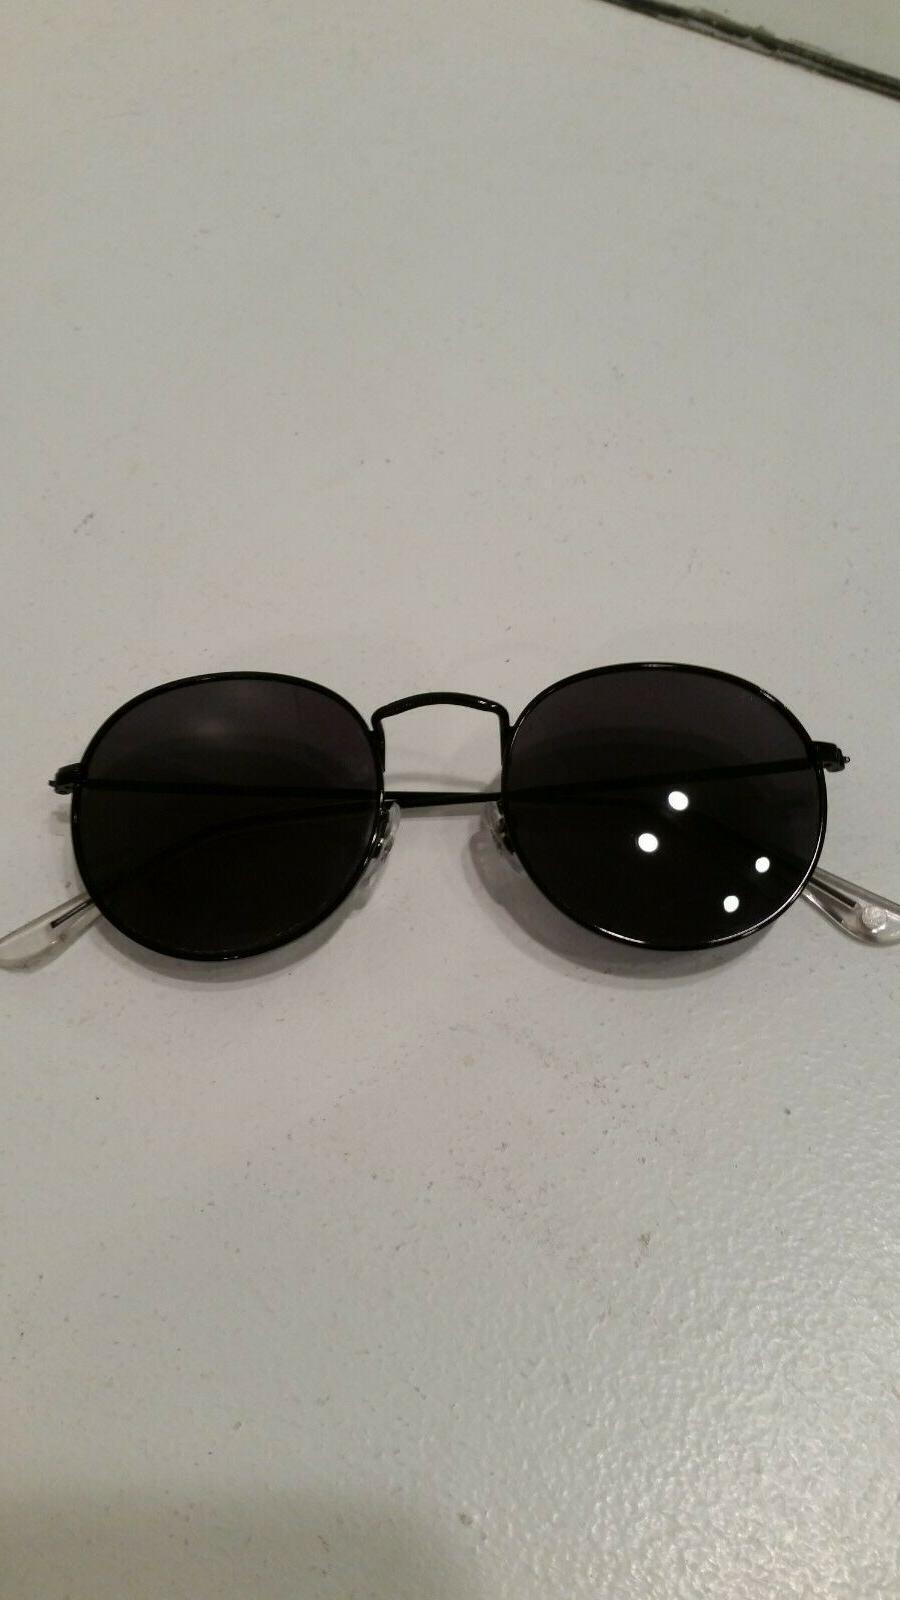 ret090 nevada polarized sunglasses black